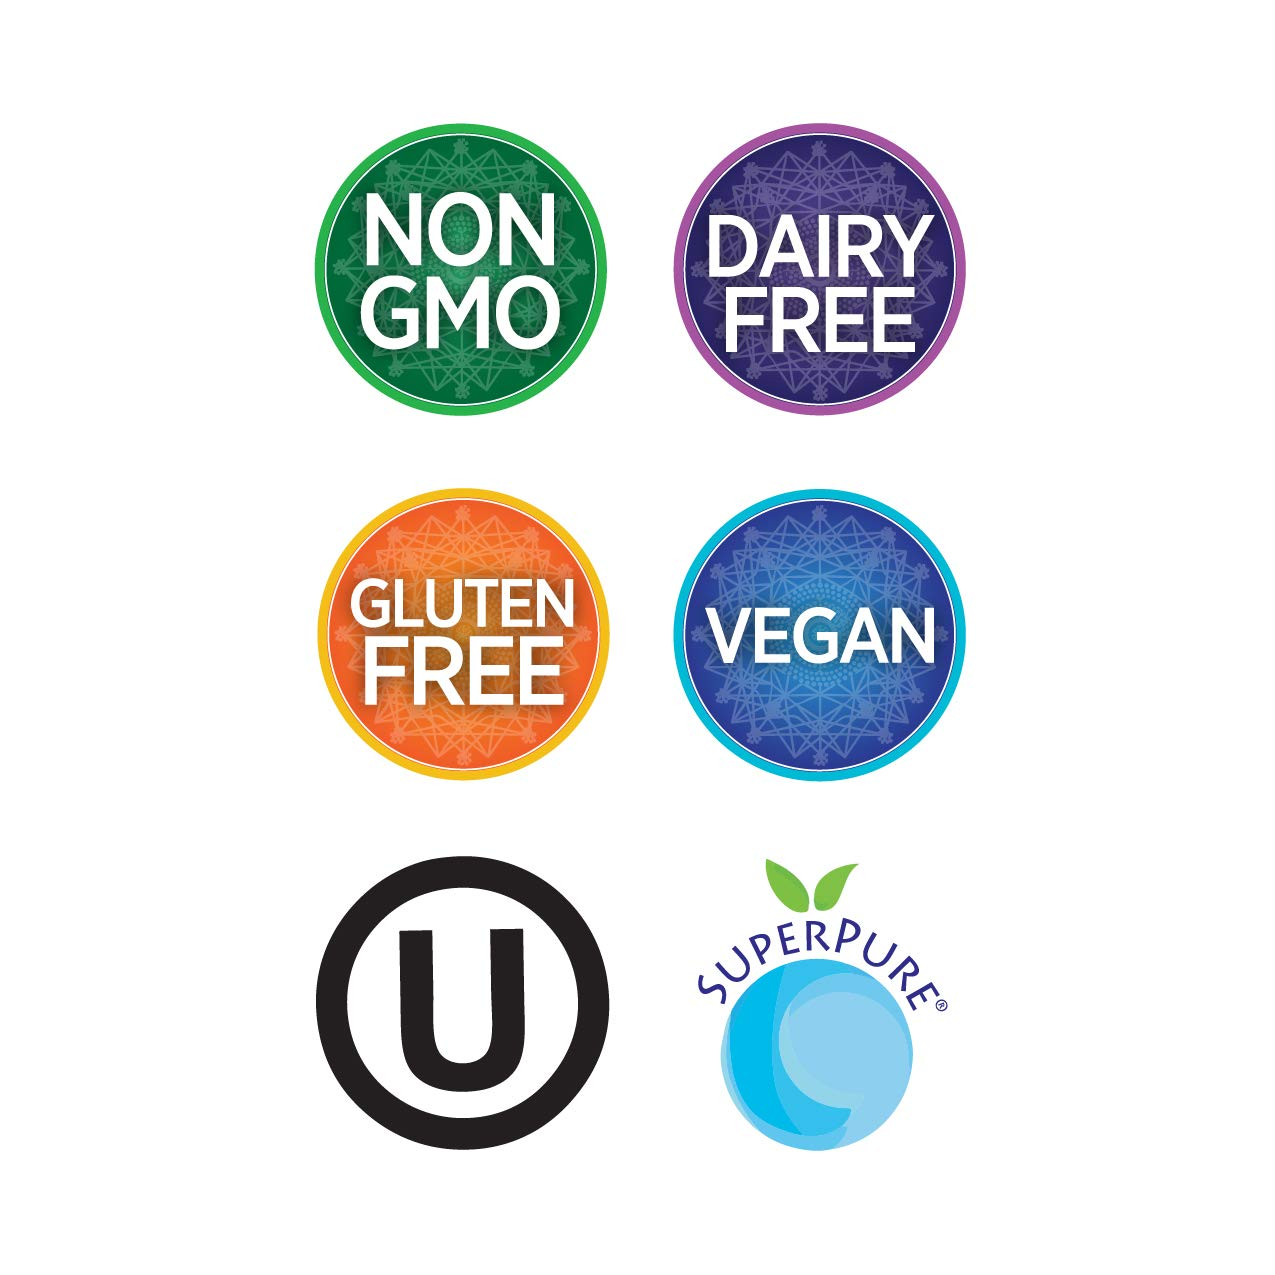 Pure Synergy SuperPure Beta 1,3-Glucan Extract   60 Capsules   Non-GMO   Vegan   Algae-Based, Yeast-Free, 500 mg, Beta Glucan Supplement